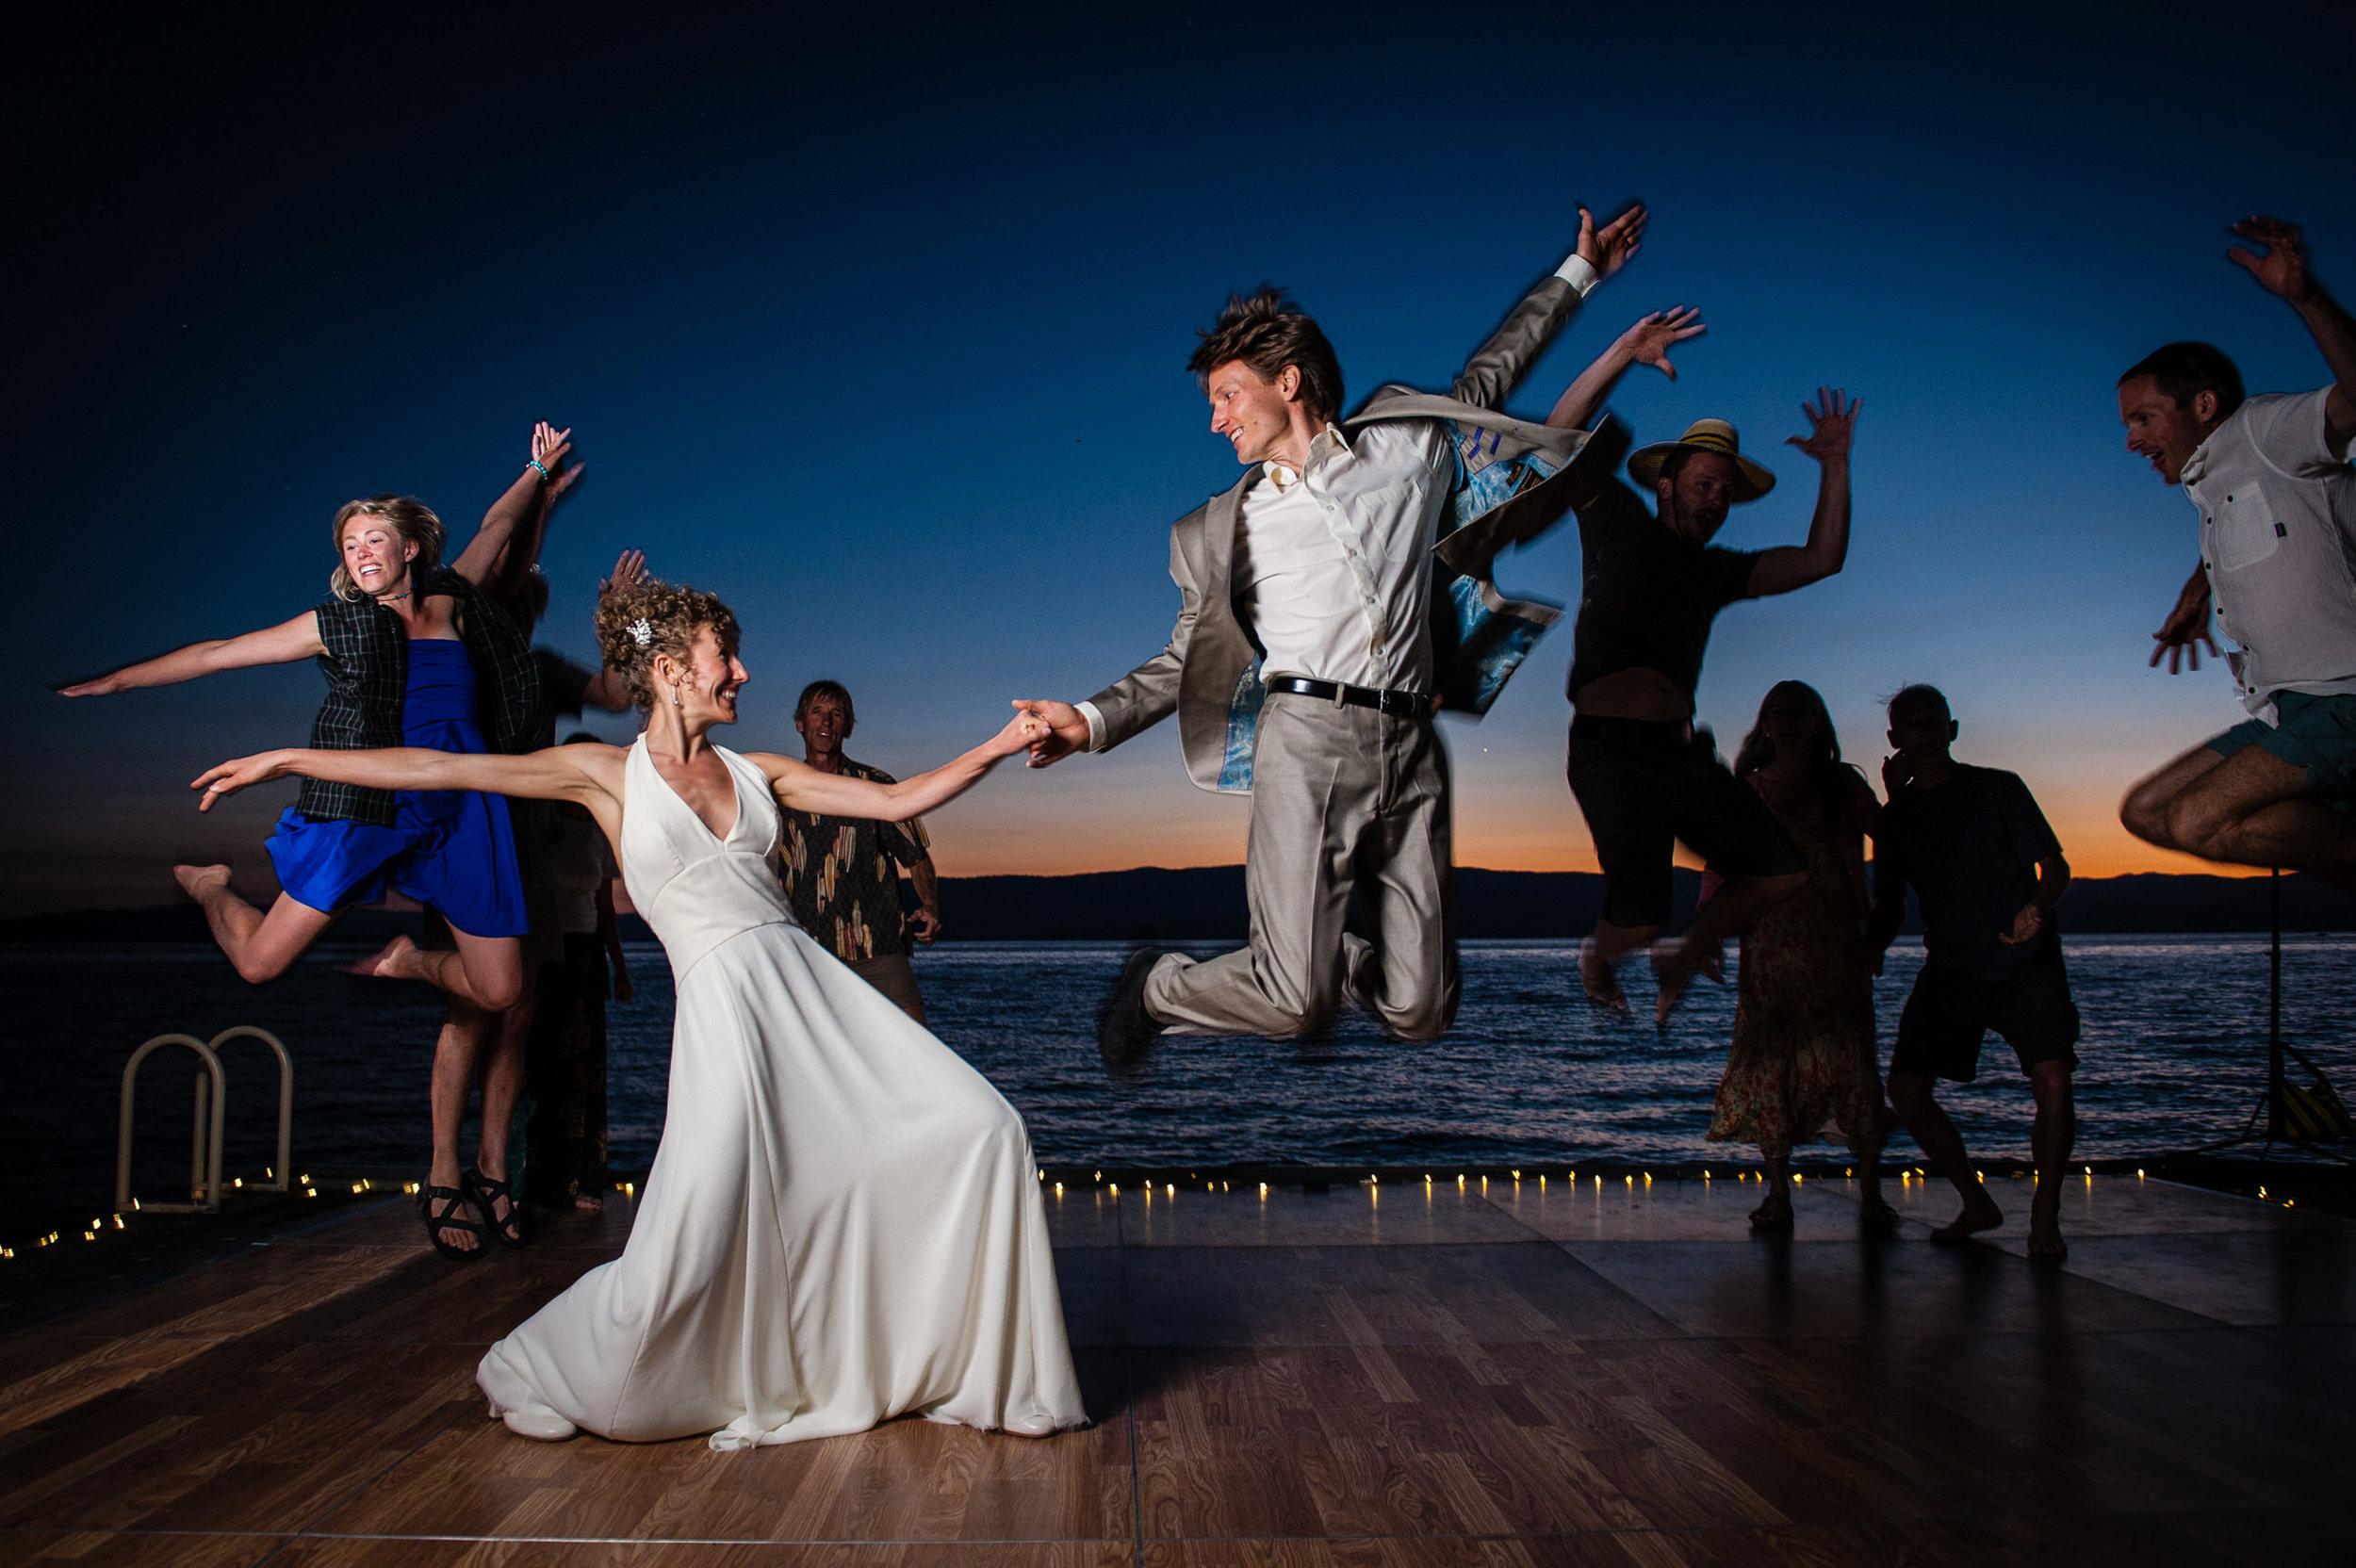 Bigfork Montana Wedding Photographer-_DSC7334.jpg